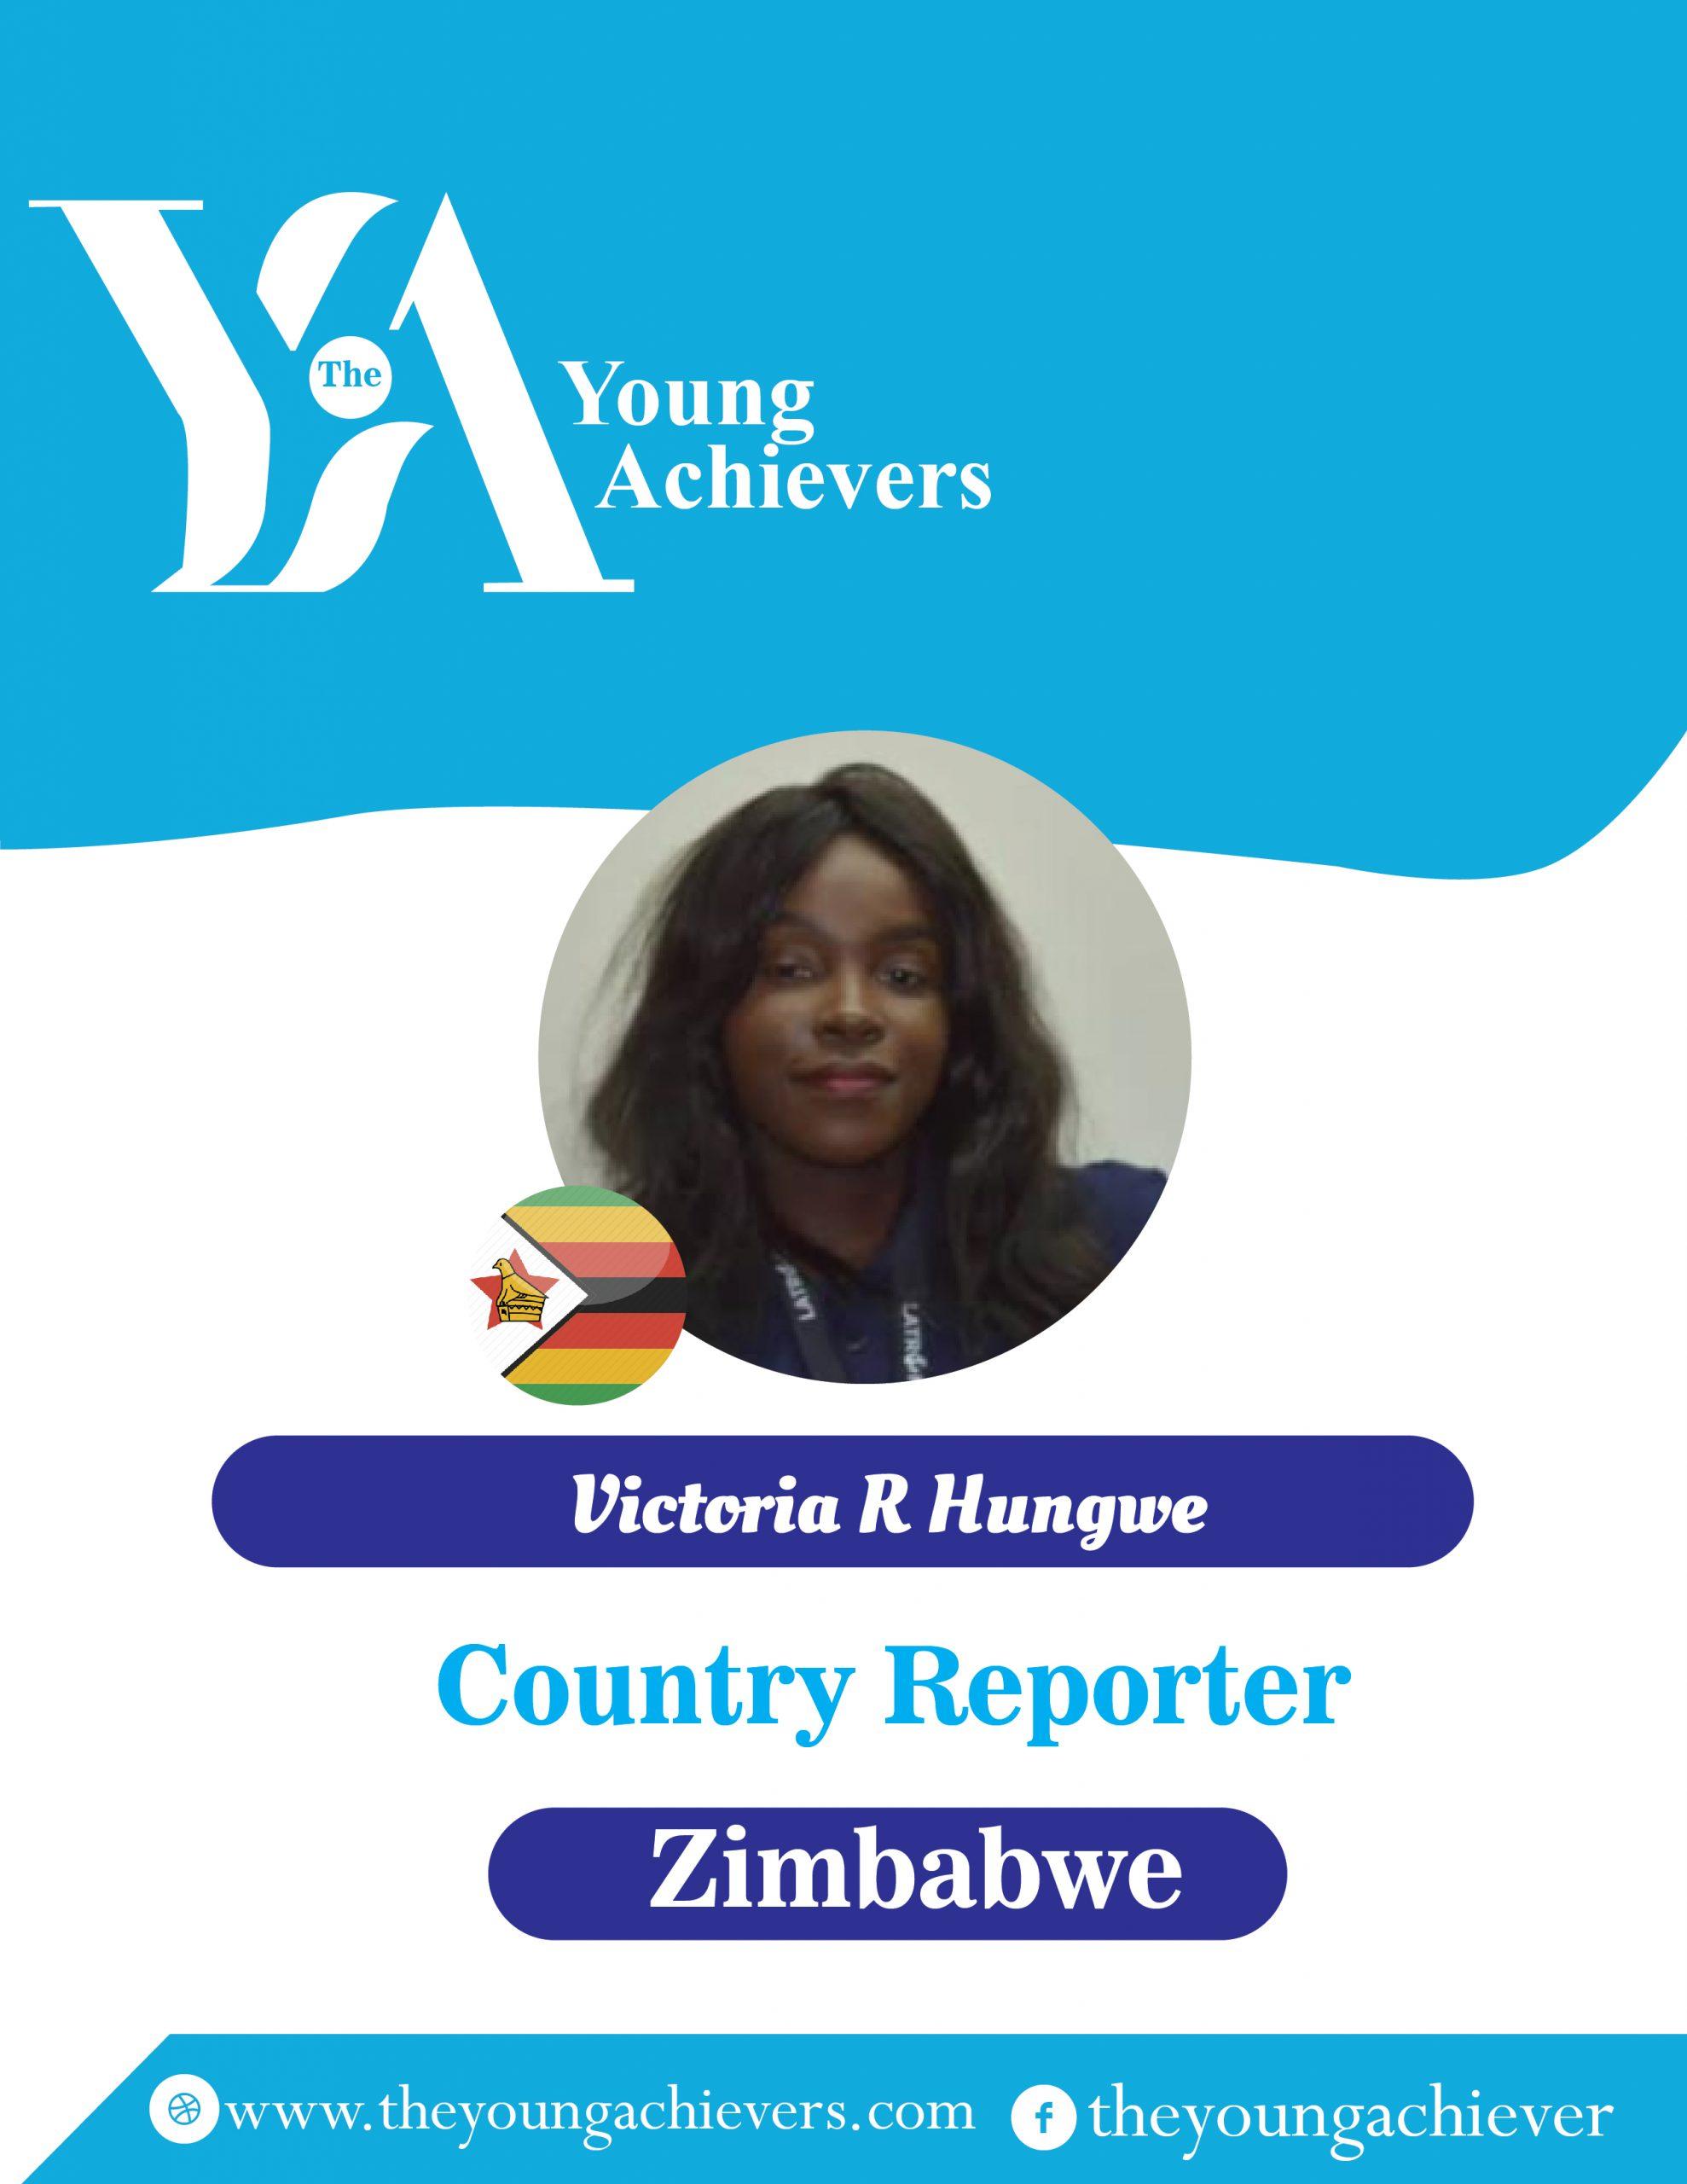 Victoria R Hungwe